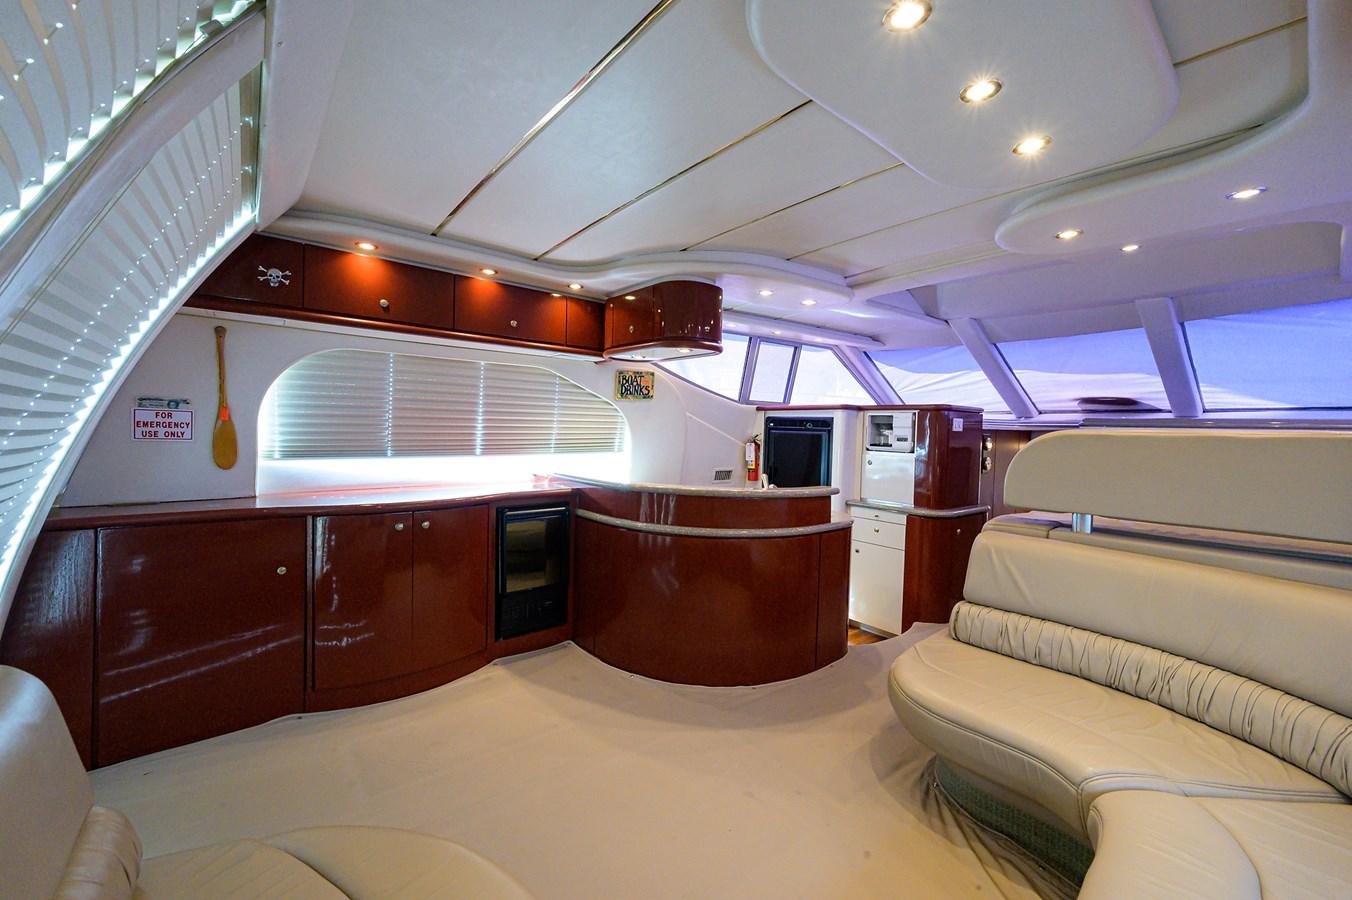 Salon 1999 MAXUM 4600 SCB  Cruiser 2884985